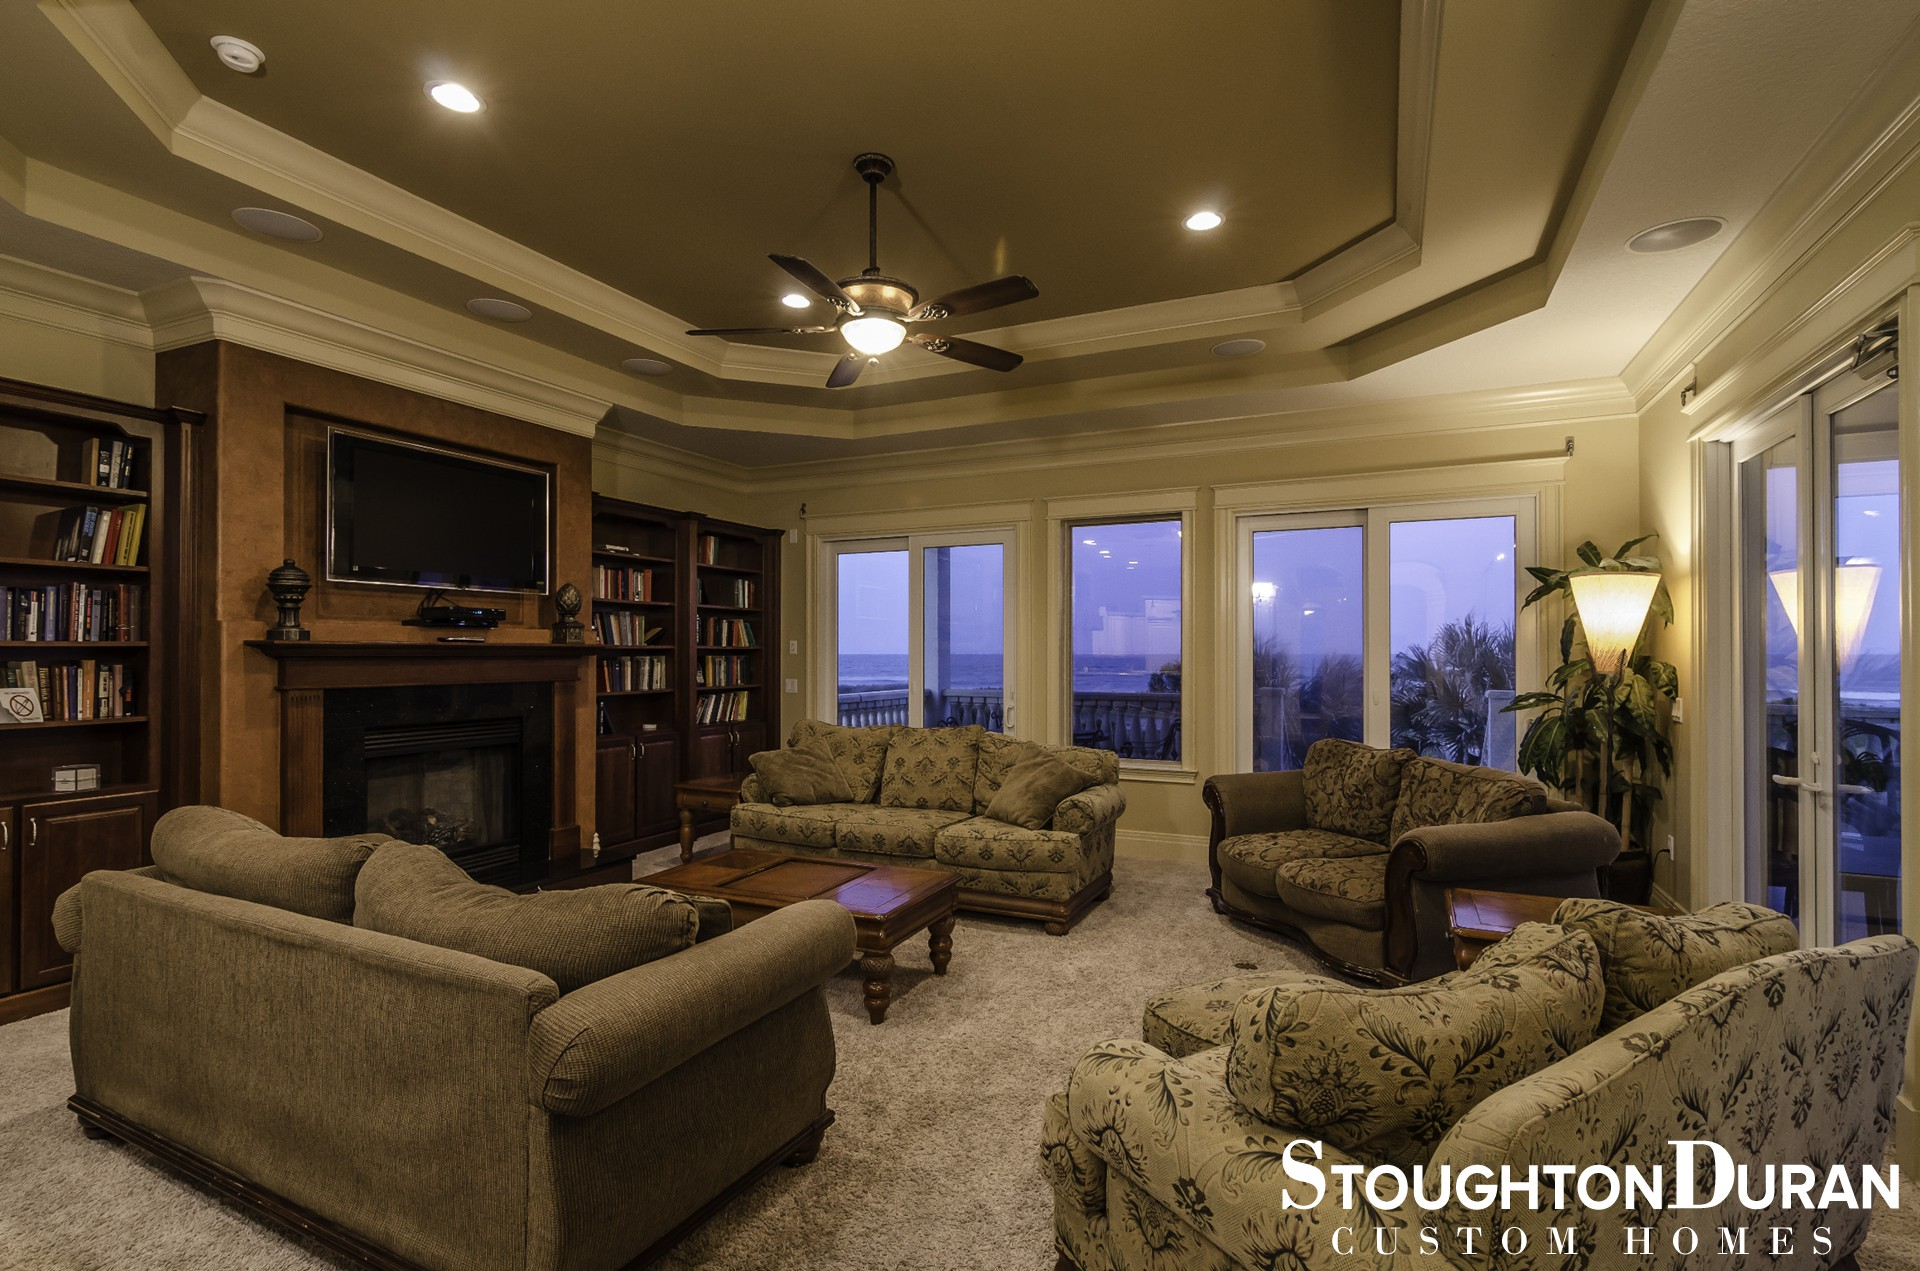 Home Design Furniture Palm Coast Fl Home And Landscaping Home Design  Furniture In Palm Coast Florida